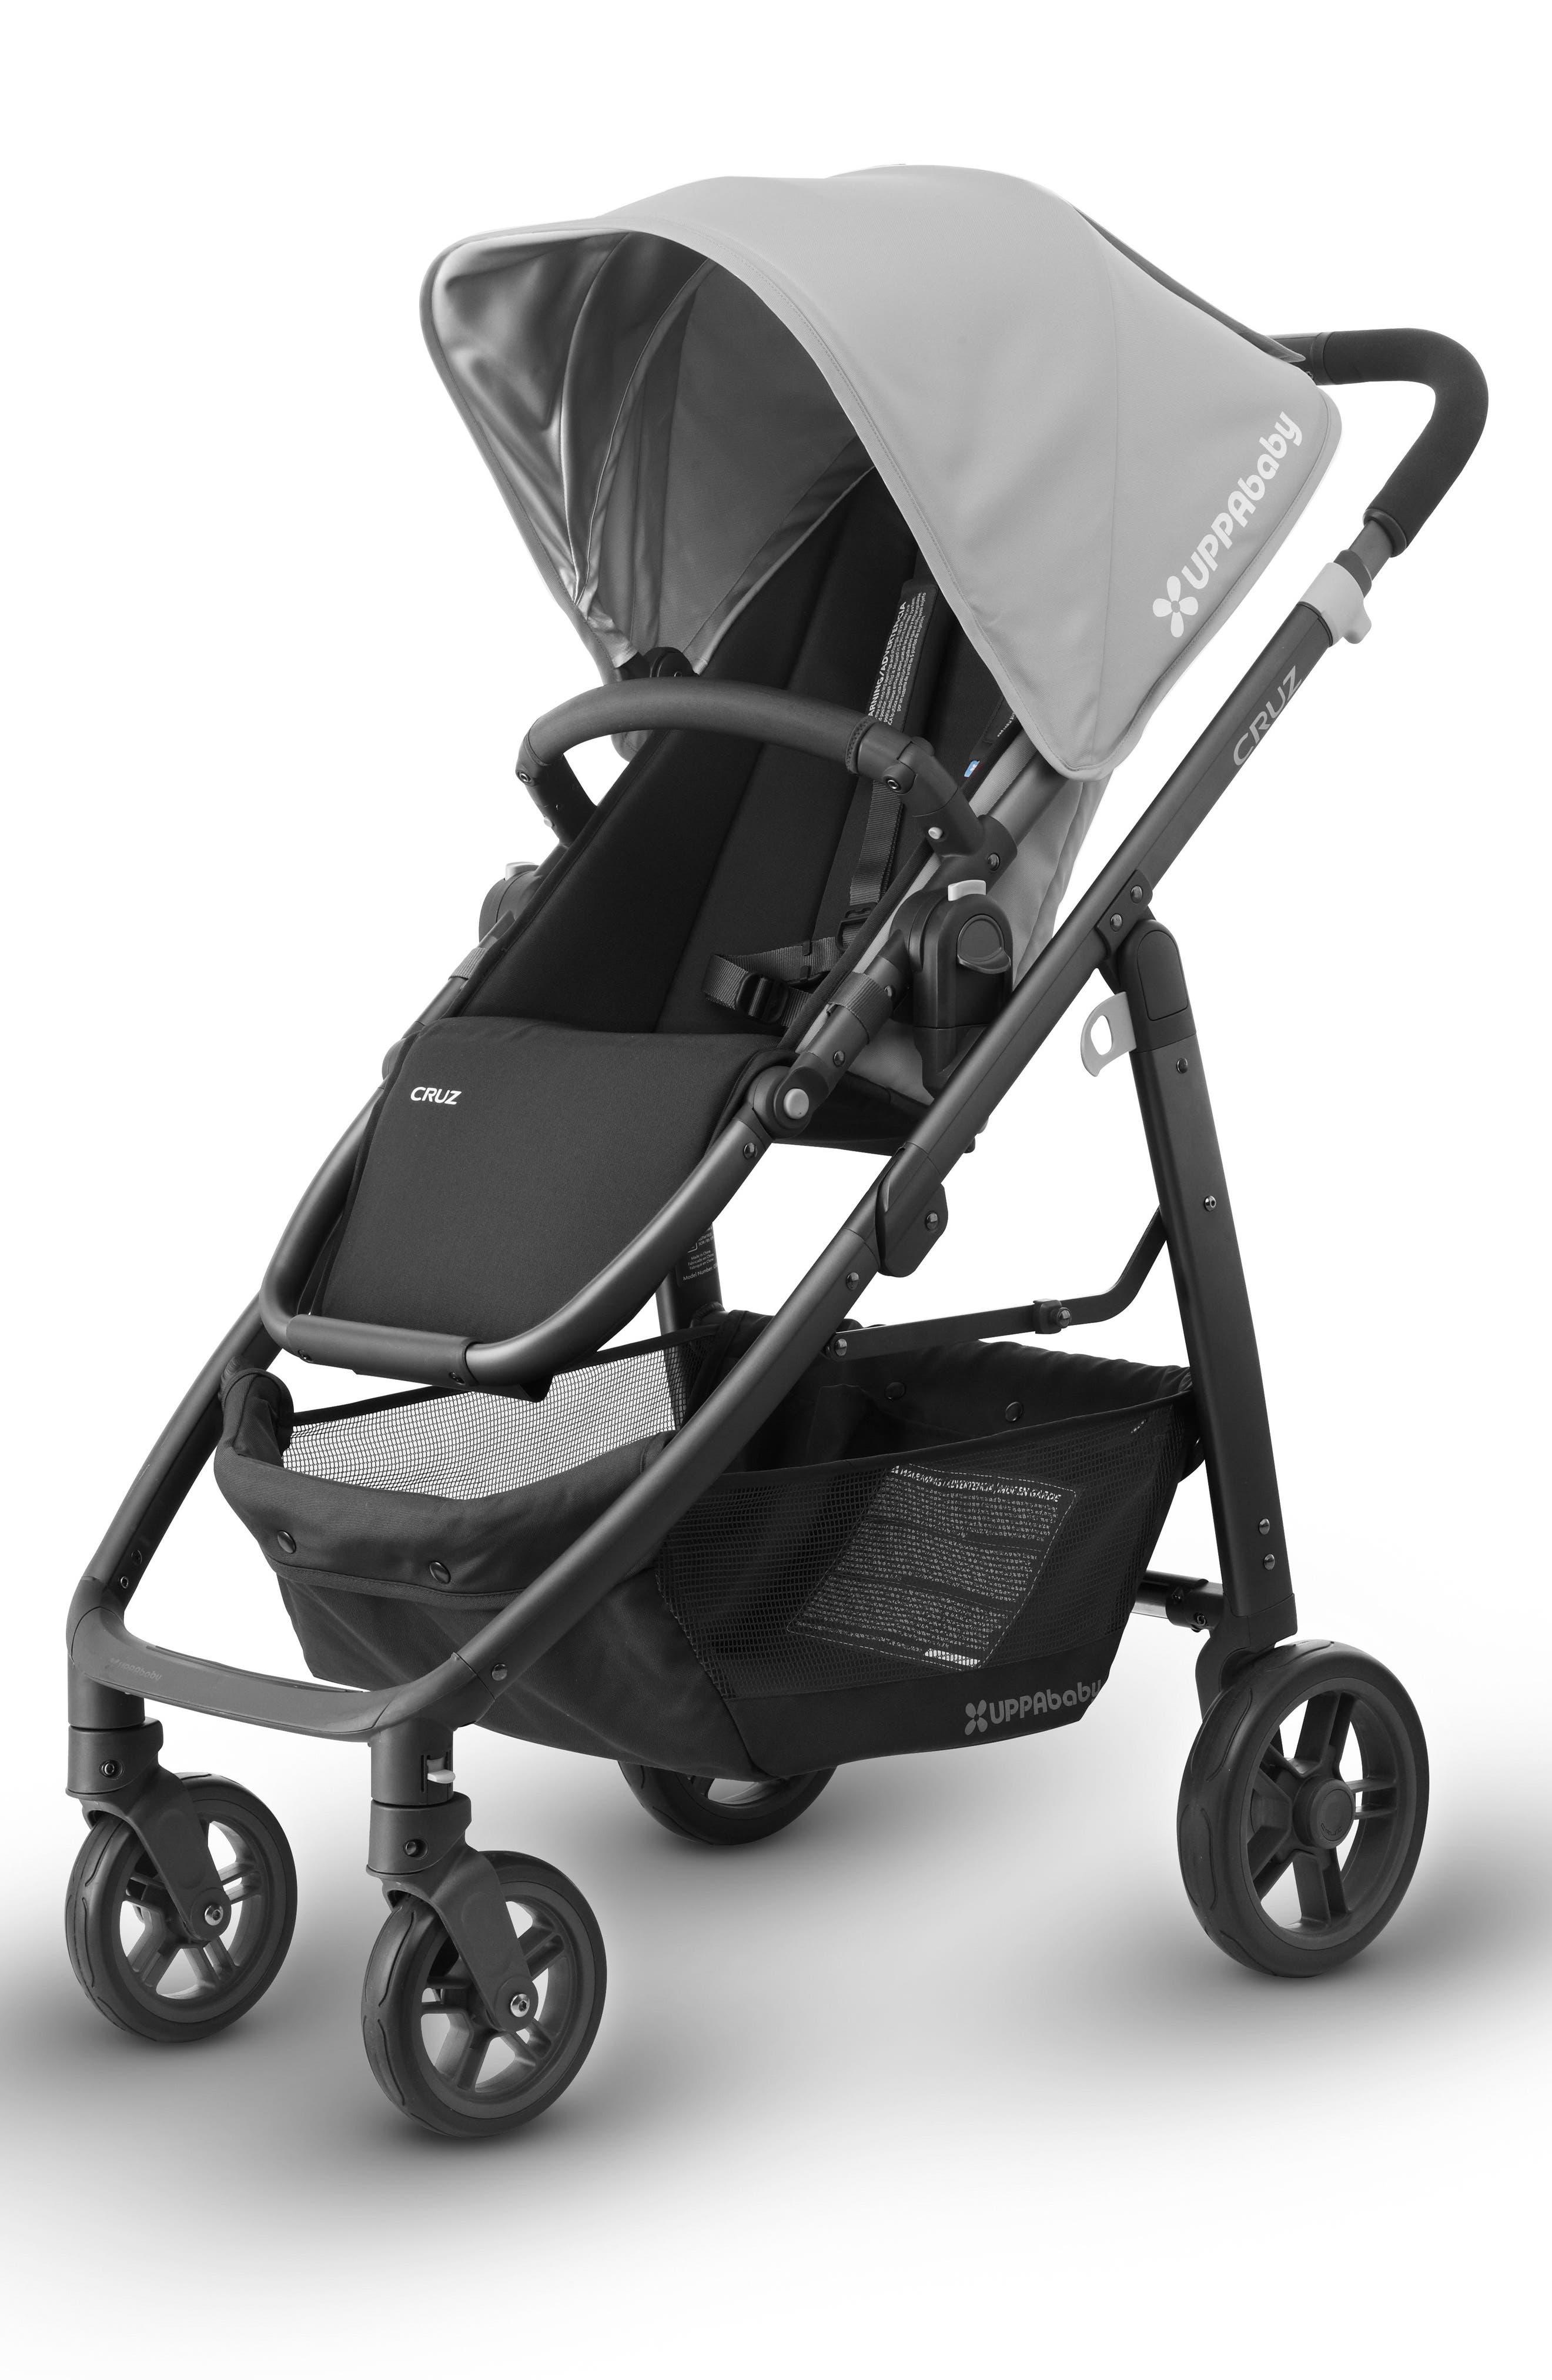 Alternate Image 1 Selected - UPPAbaby 2017 CRUZ Aluminum Frame Stroller